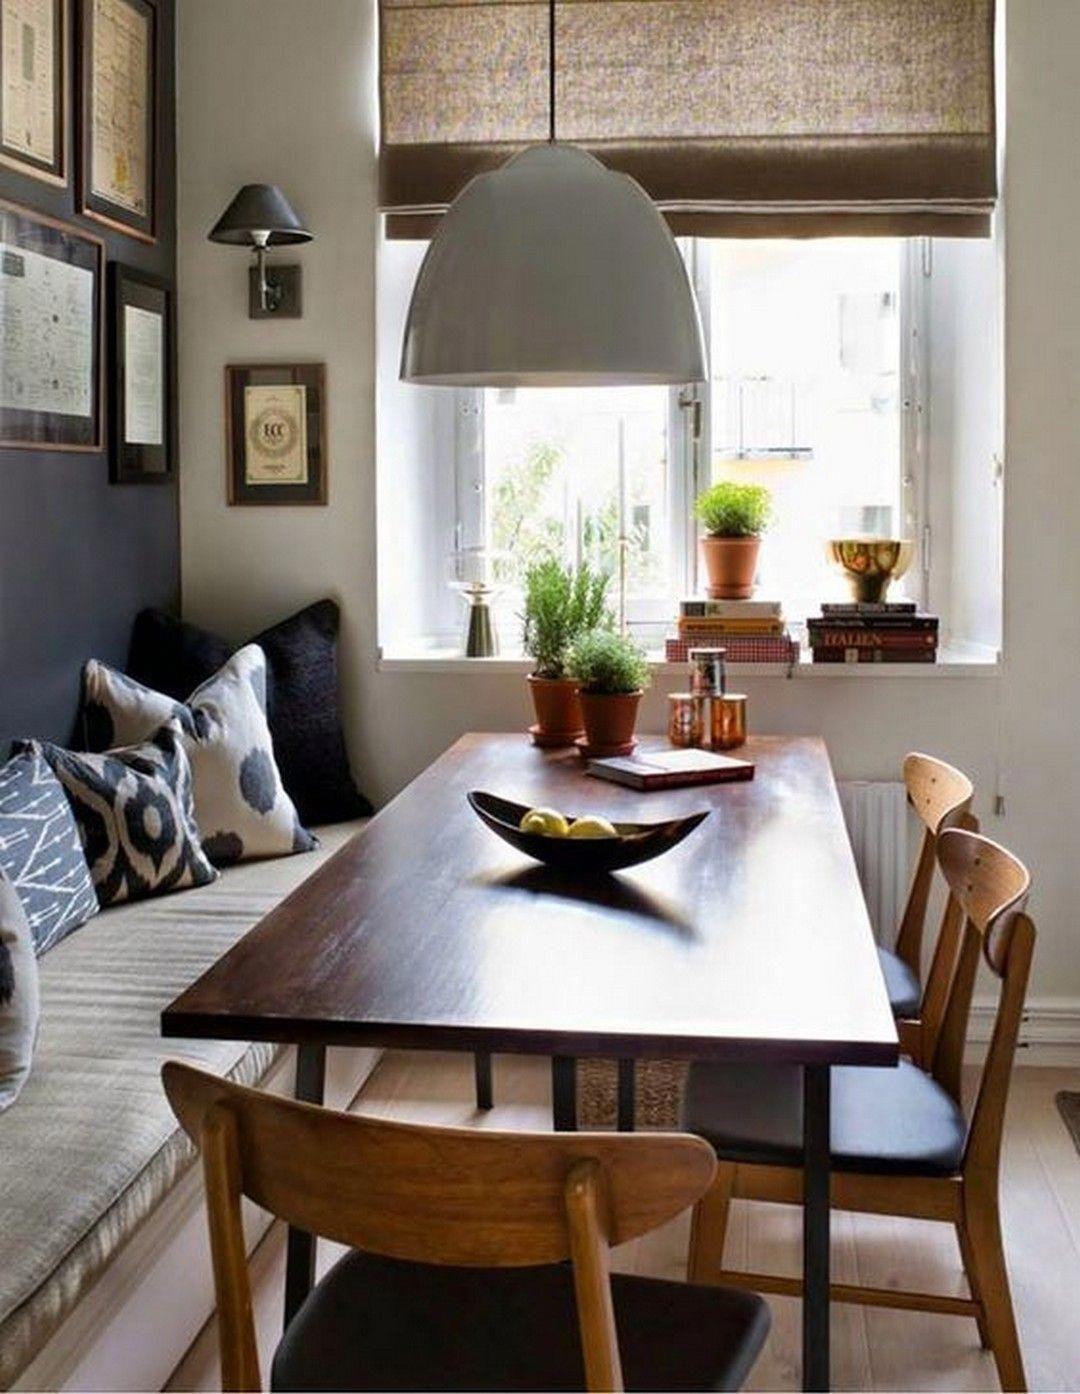 Diningroomideas | furniture in 2019 | Dining room table ...